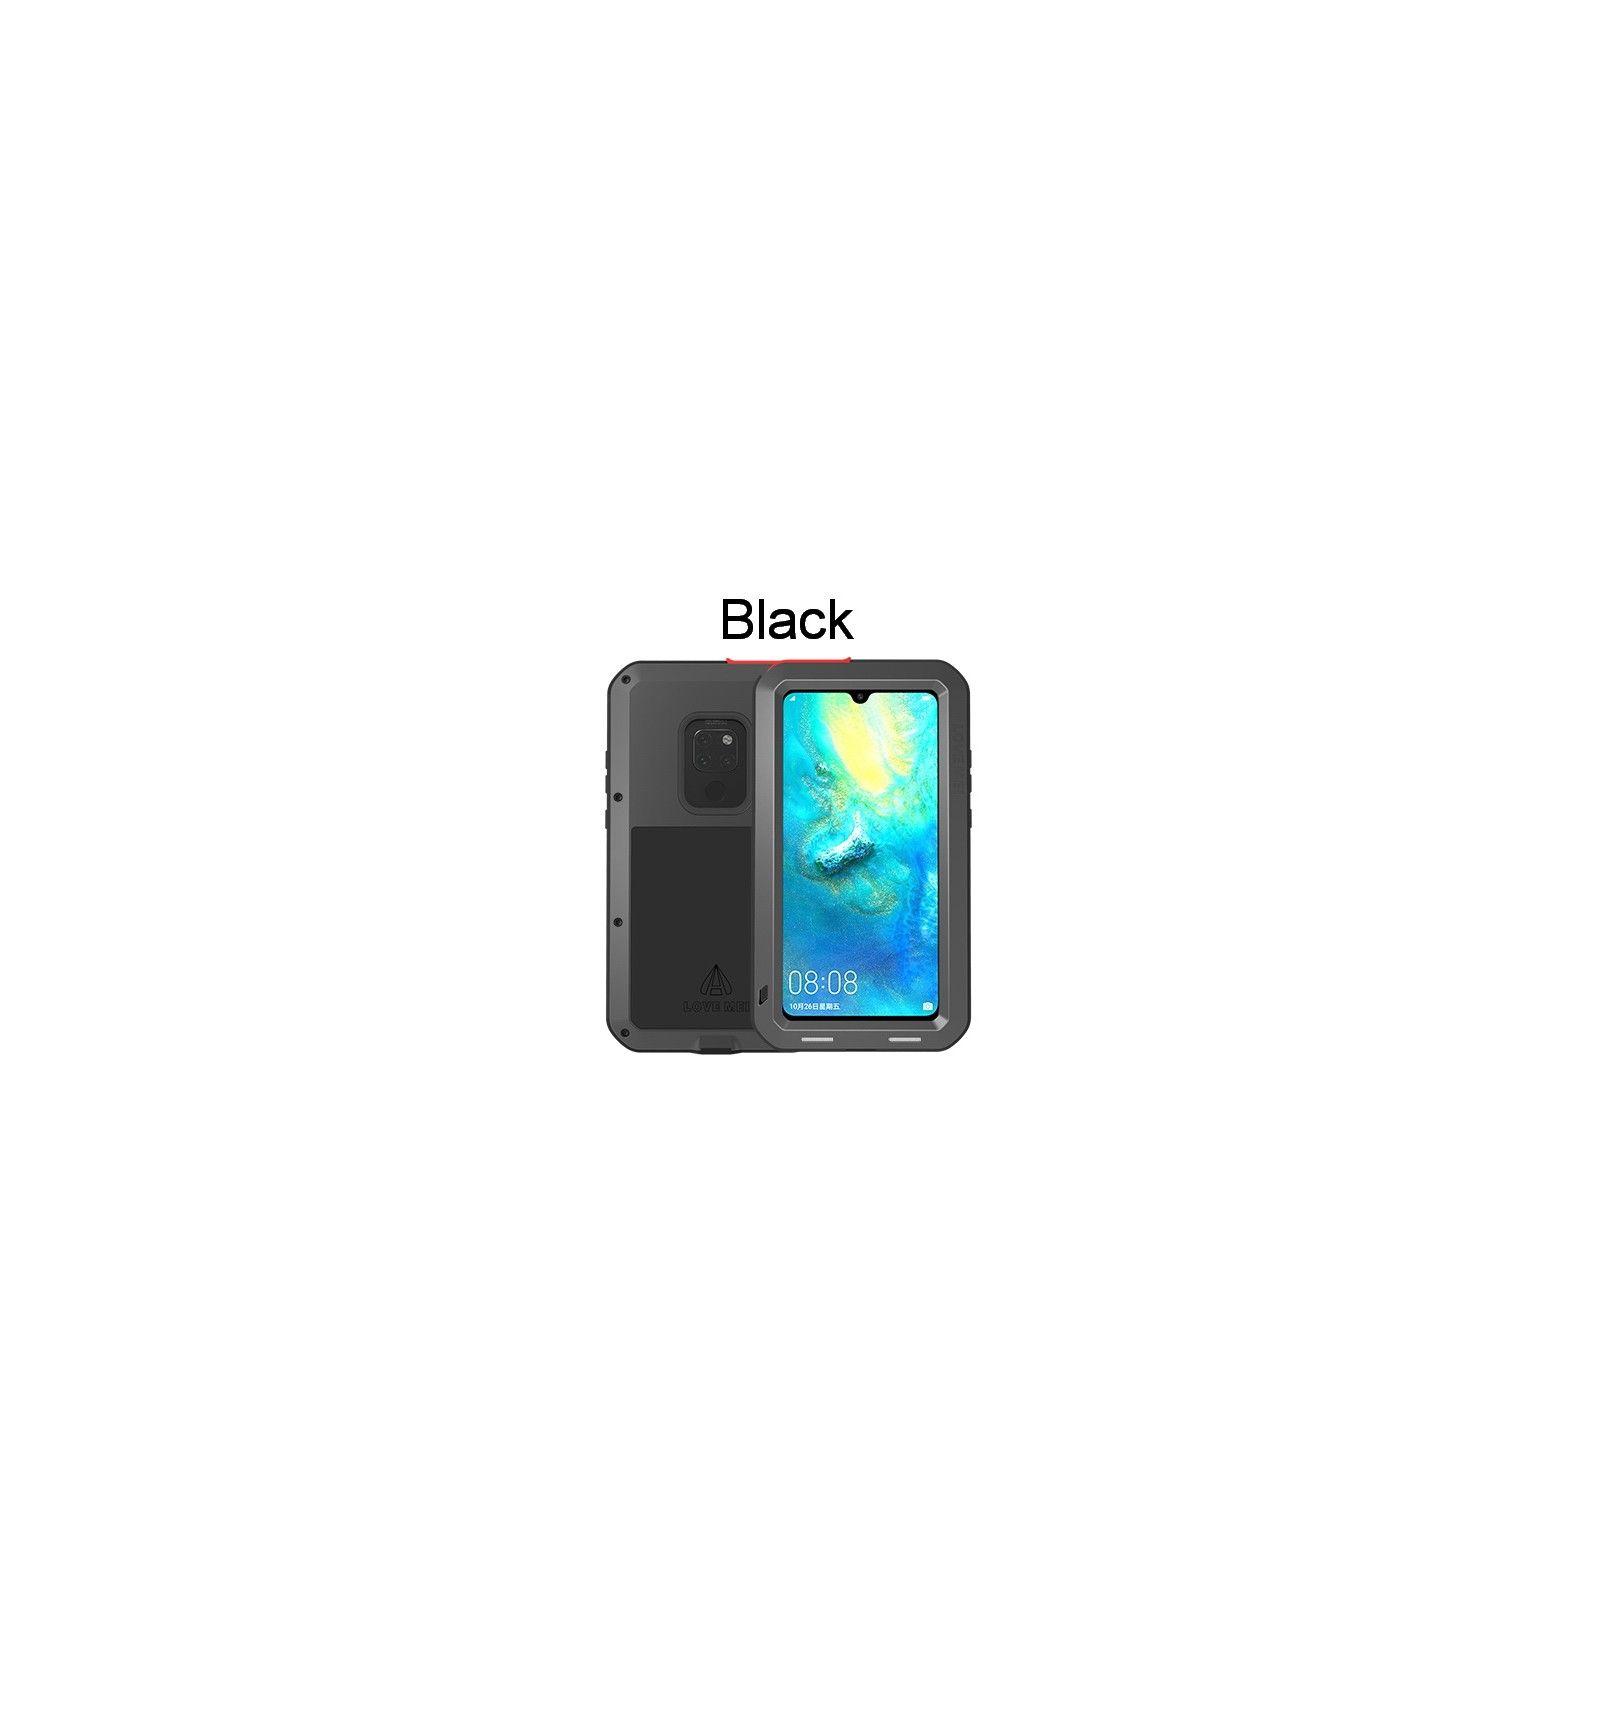 Lovemei Huawei Mate 20 Pro Stossfestes Gehause Stossfanger Aus Metall Mit Wasserdichter Staubdichter Displayschutzfolie Wearable Cell Phone Cases Smart Watch